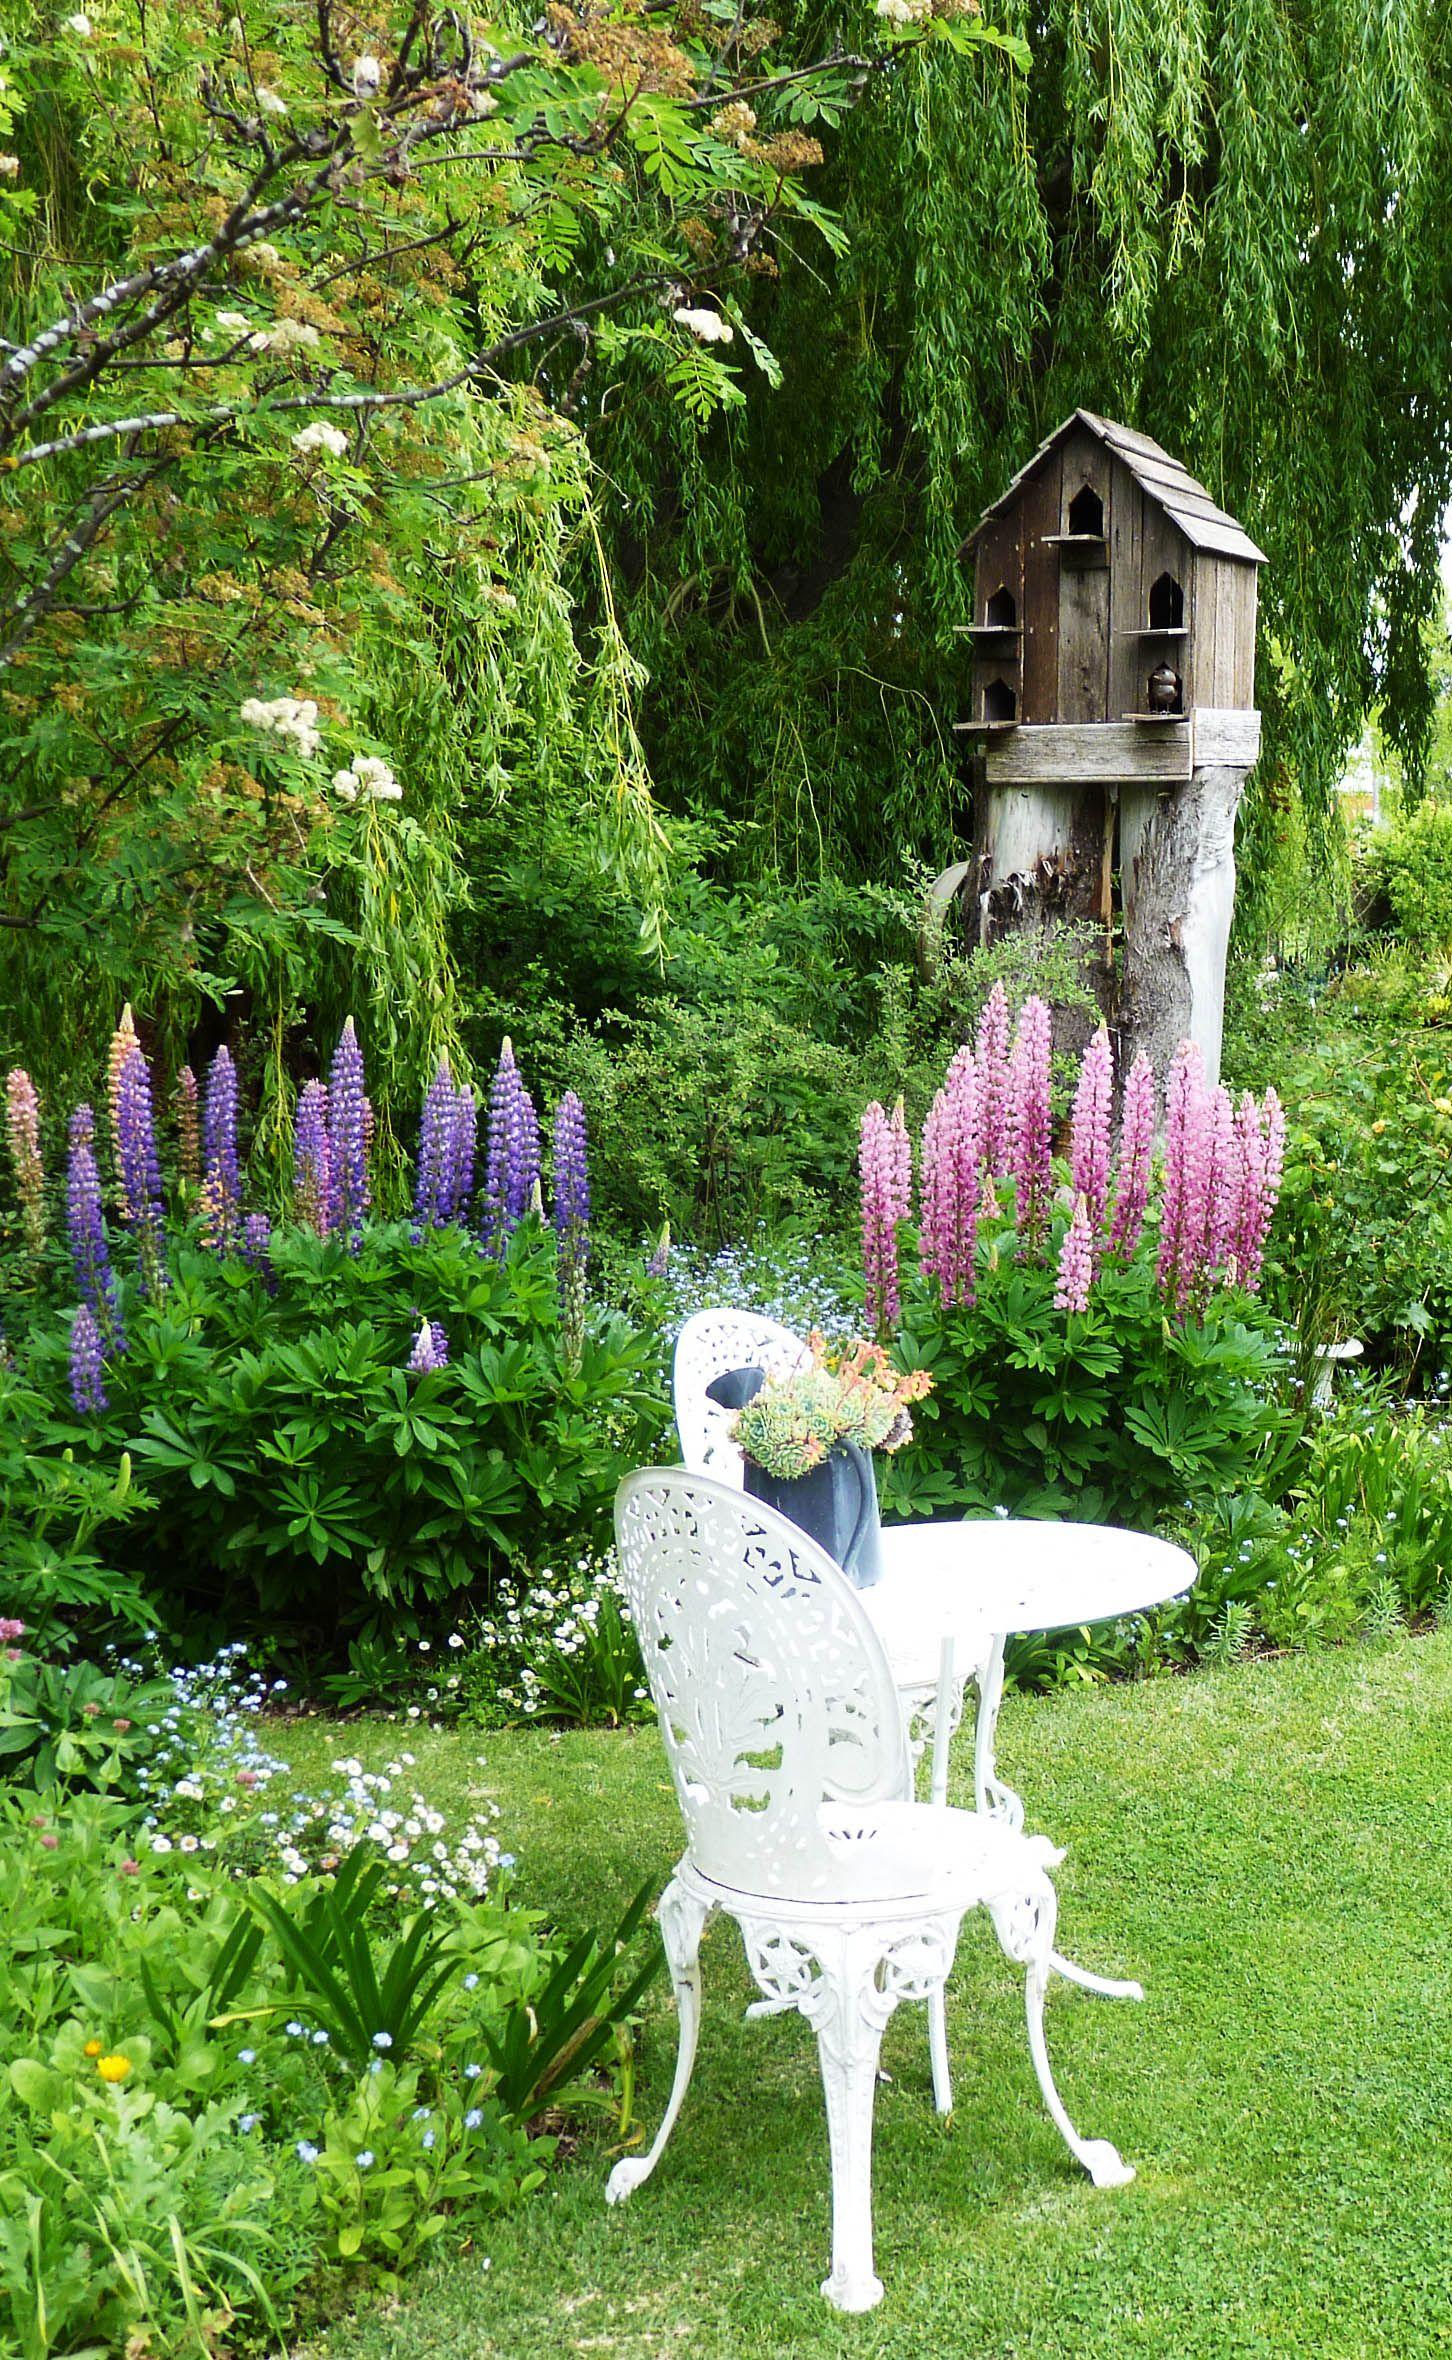 Secret Garden: A Country Garden In Tasmania. Love The White Iron Bistro